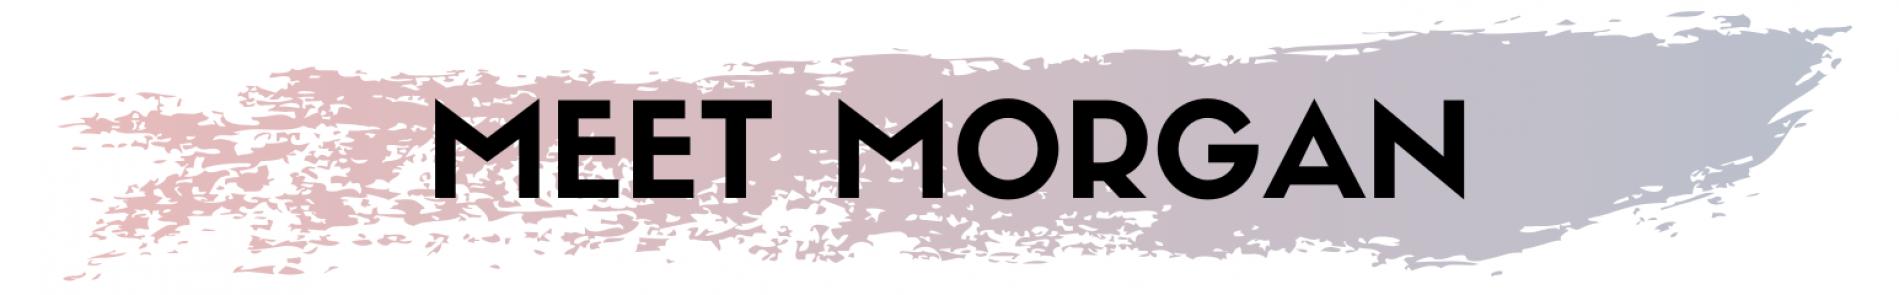 meet-morgan